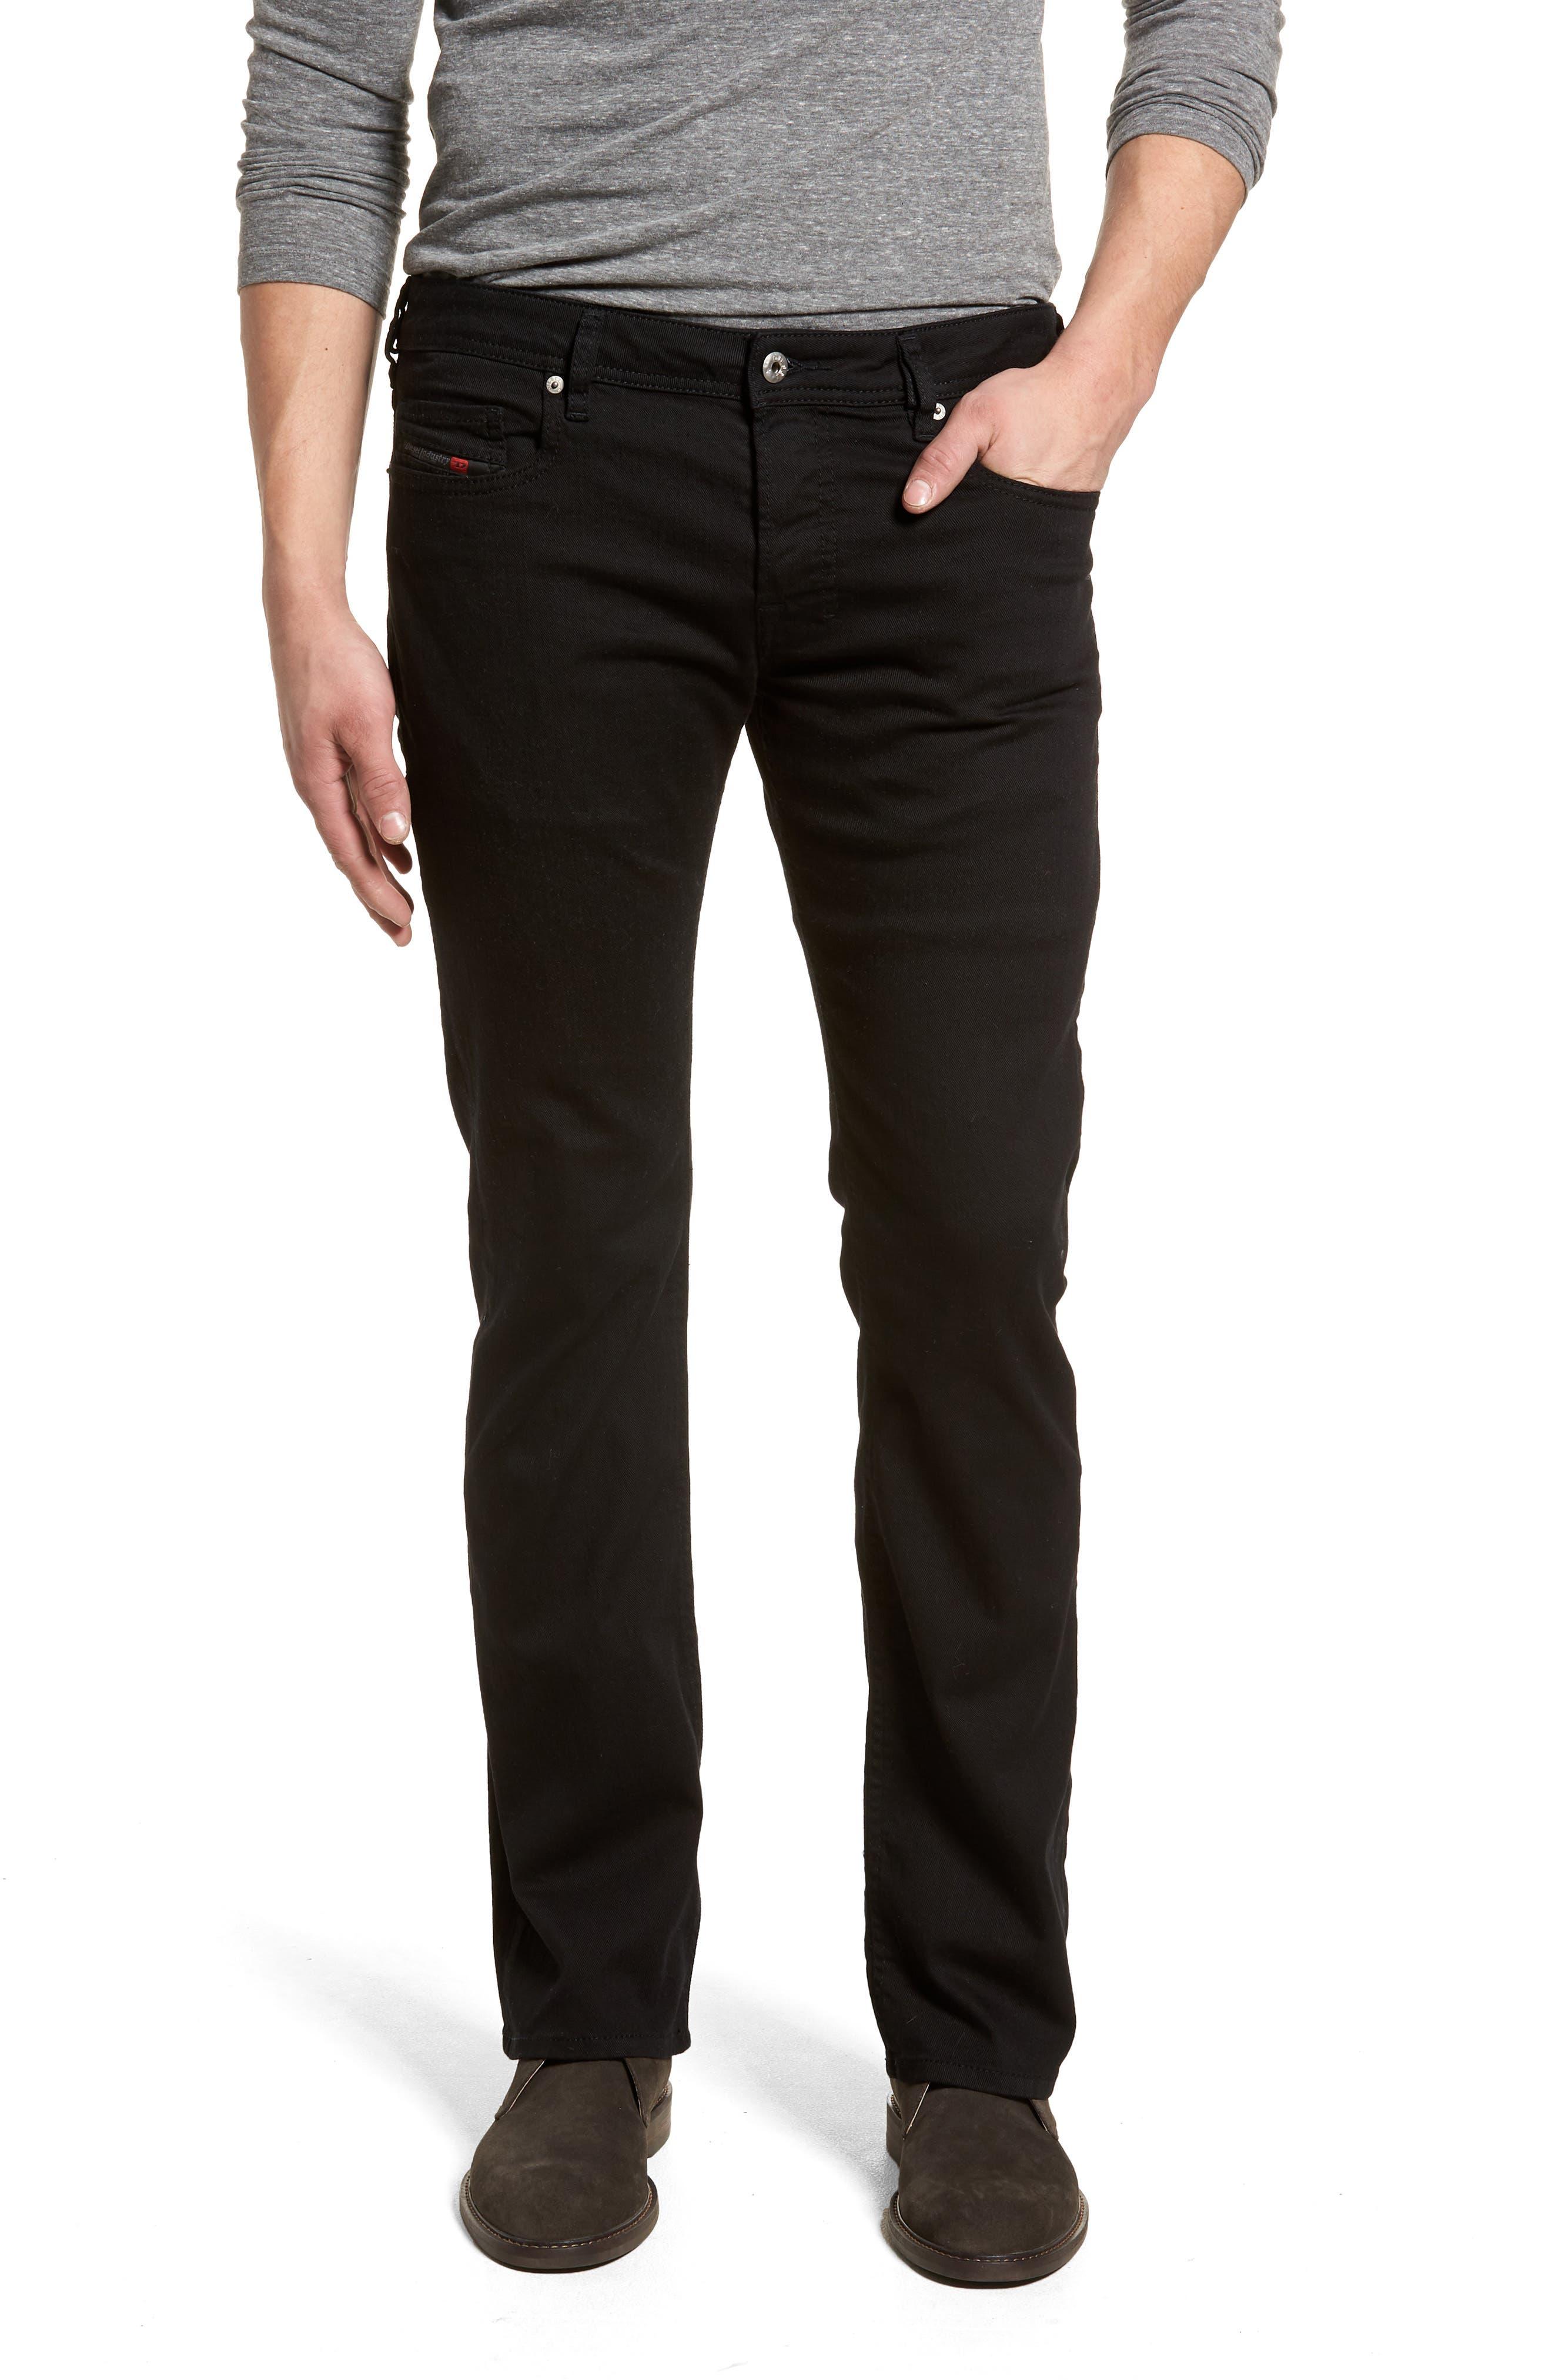 Zatiny Bootcut Jeans,                         Main,                         color, 0688H